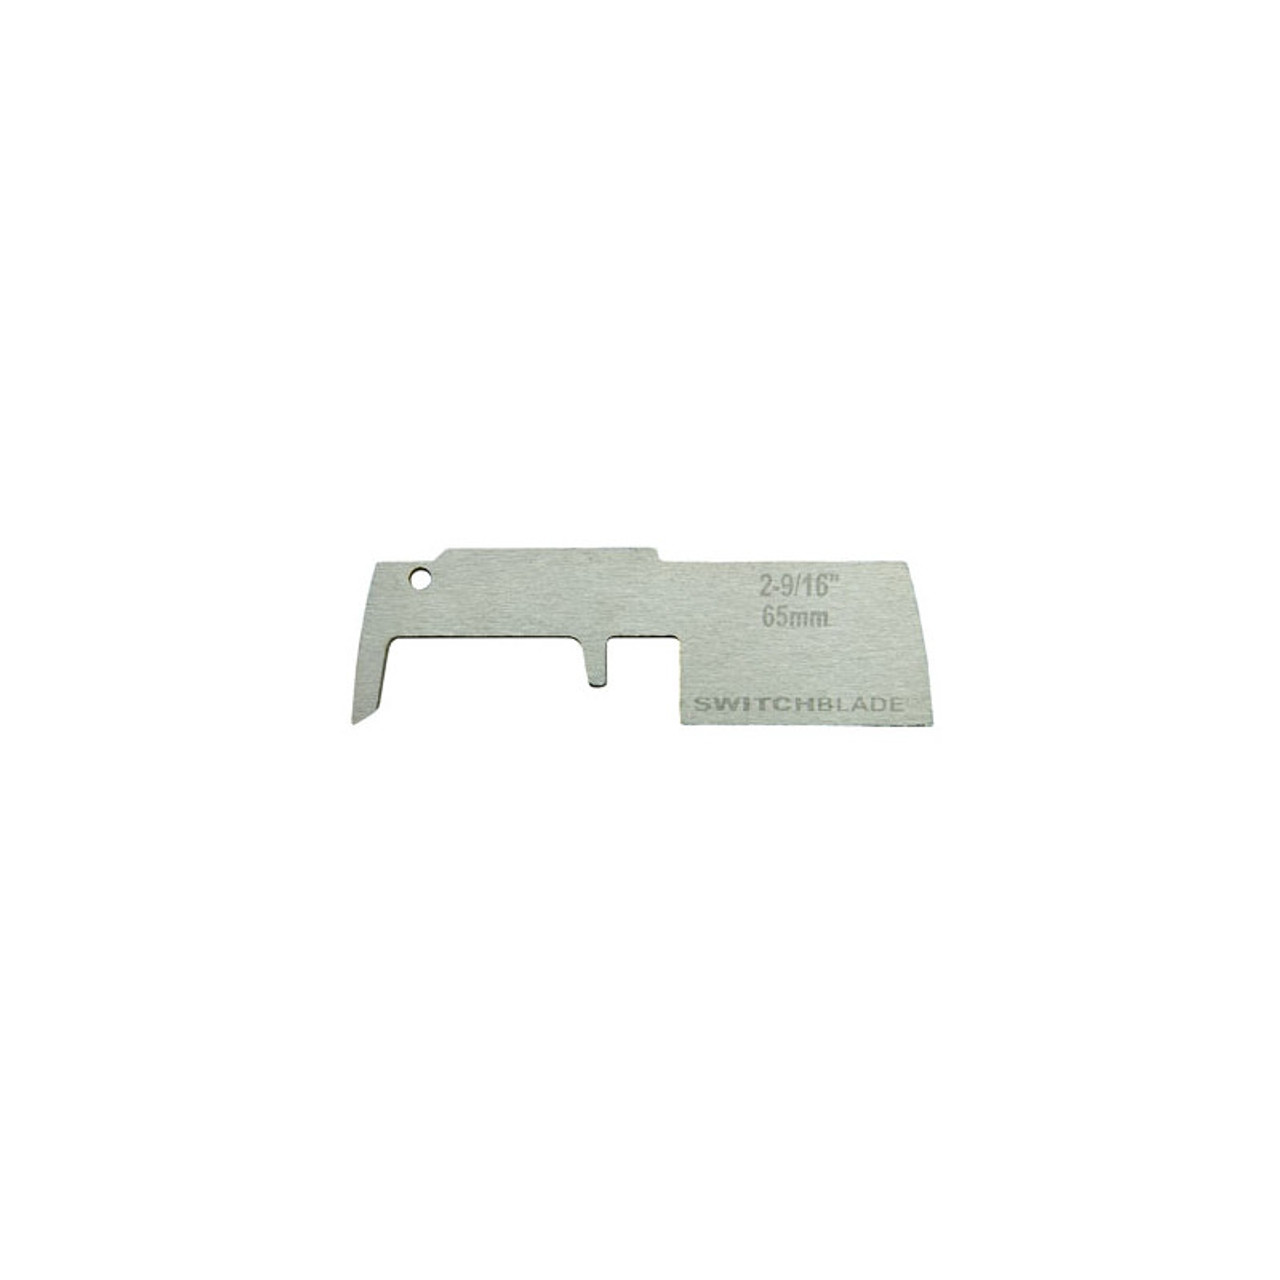 2 Switchblade Selfeed Bit 48-25-5135 No